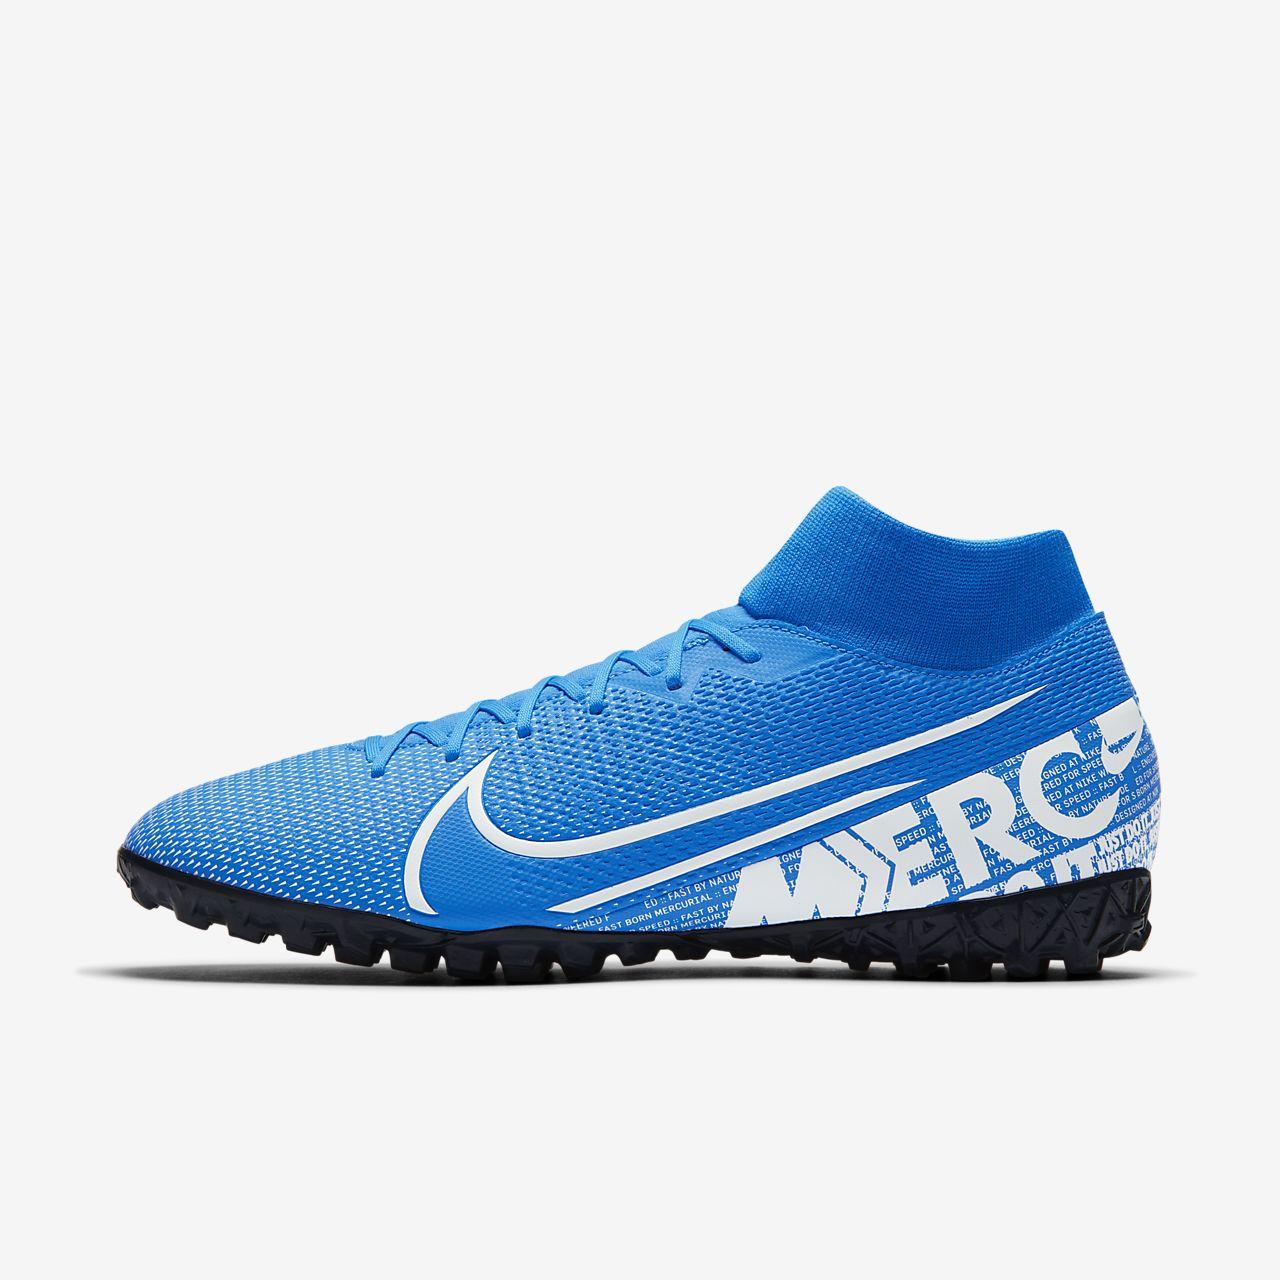 Nike Mercurial Superfly 7 Academy TF-fodboldsko til grus